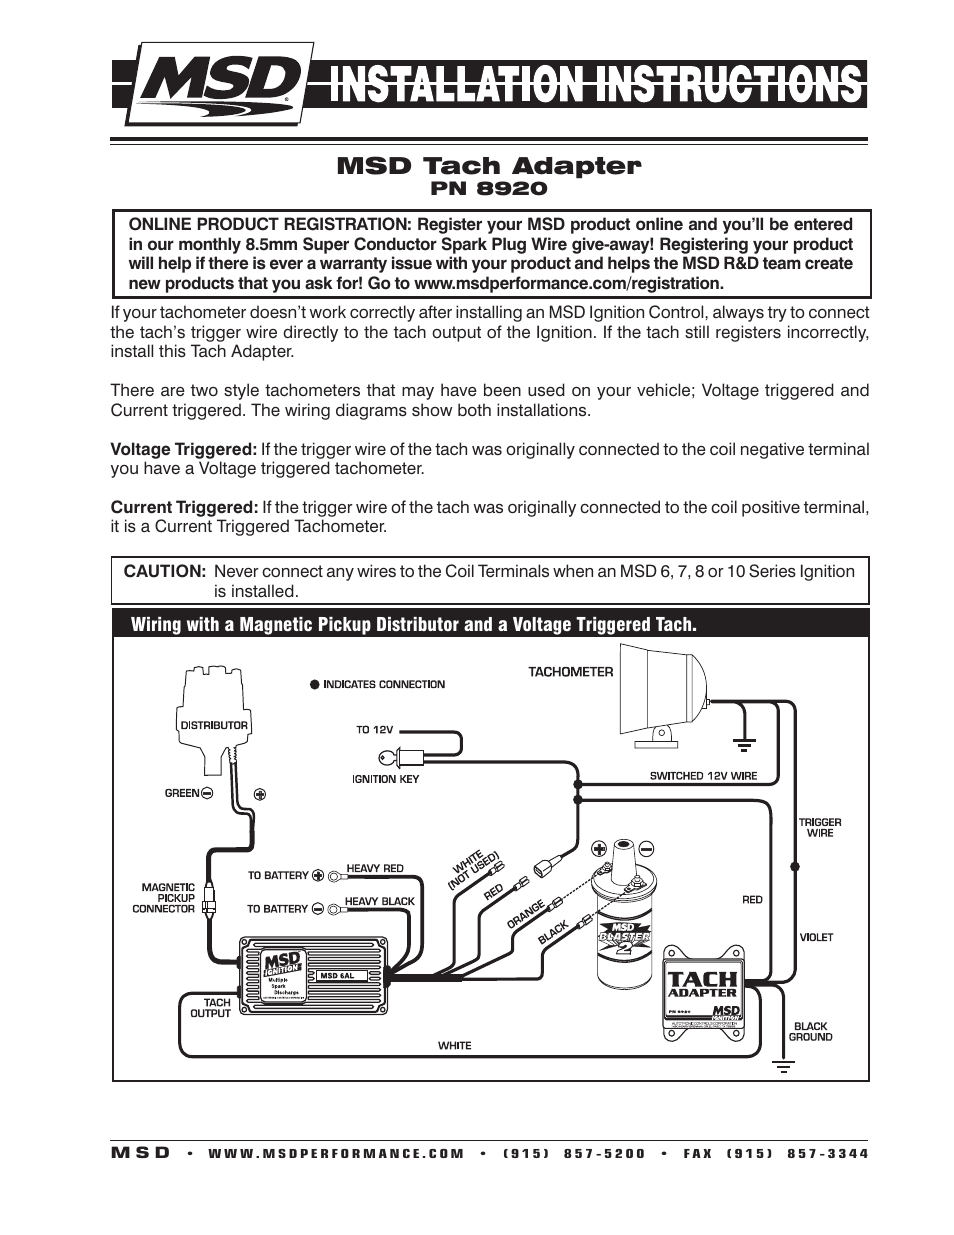 Msd 8920 Tach Adapter Wiring Diagram Auto Electrical Porsche 911 Mirror